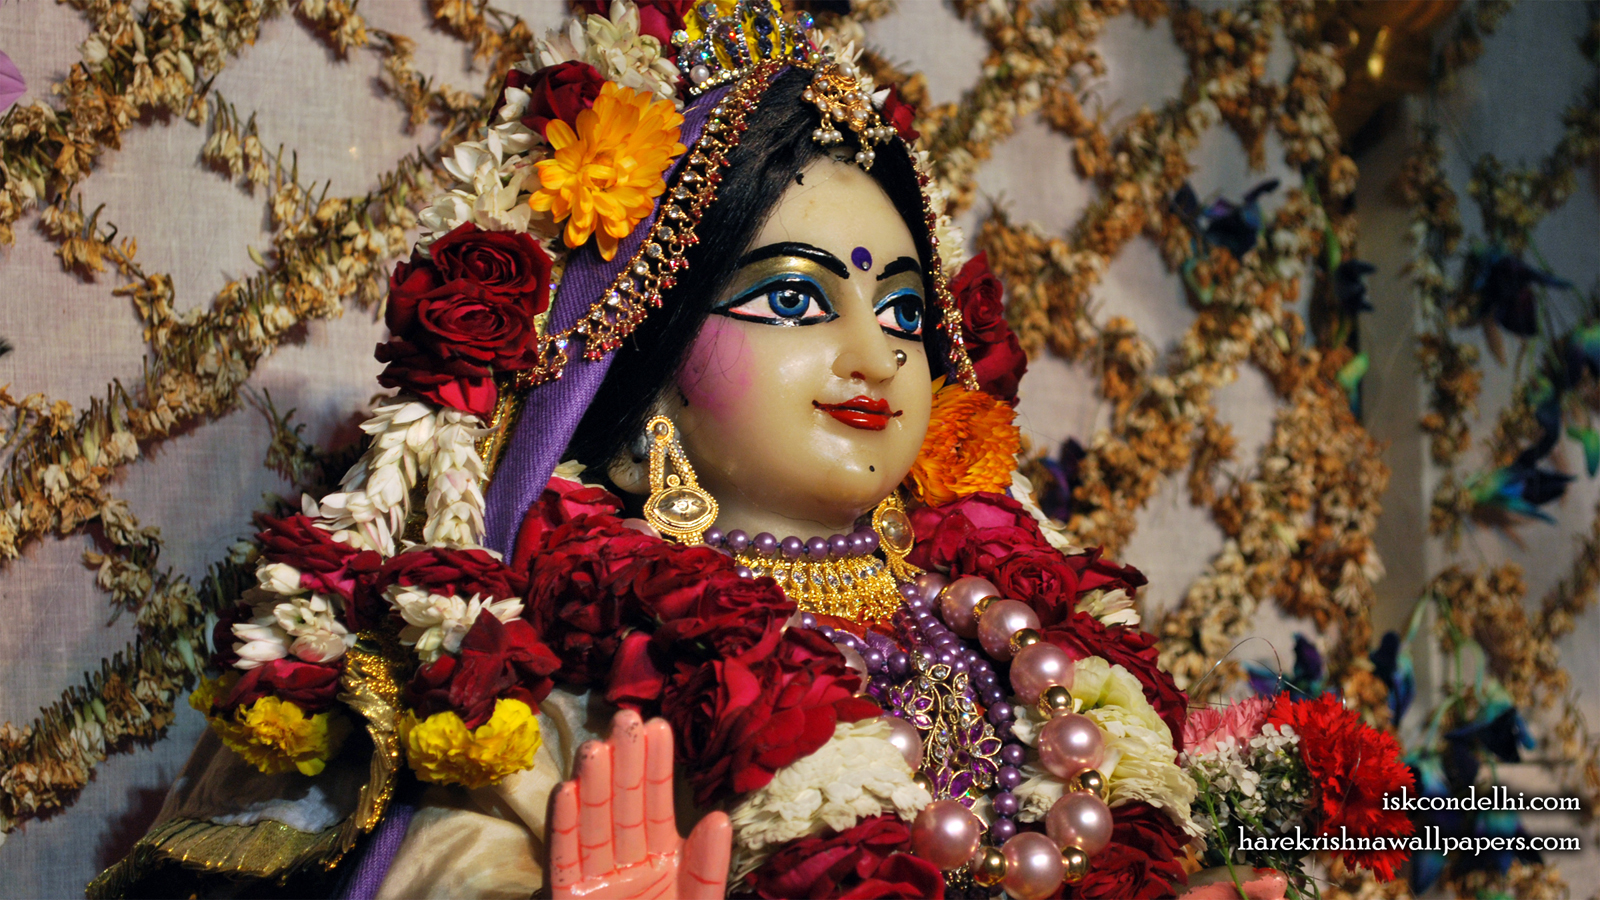 Sri Radha Close up Wallpaper (030) Size 1600x900 Download